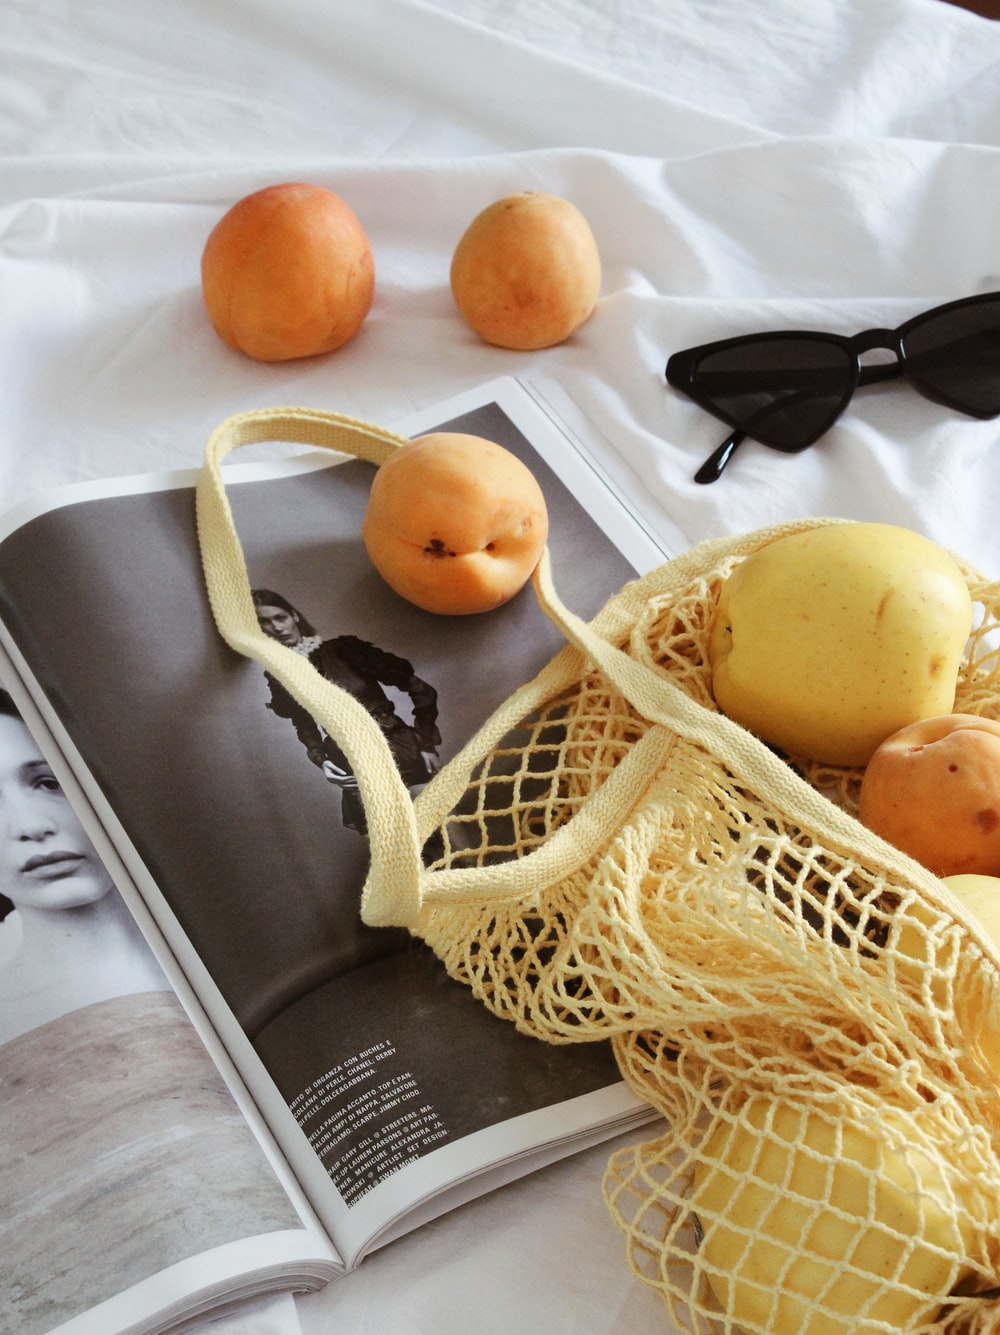 black sunglasses beside orange fruit